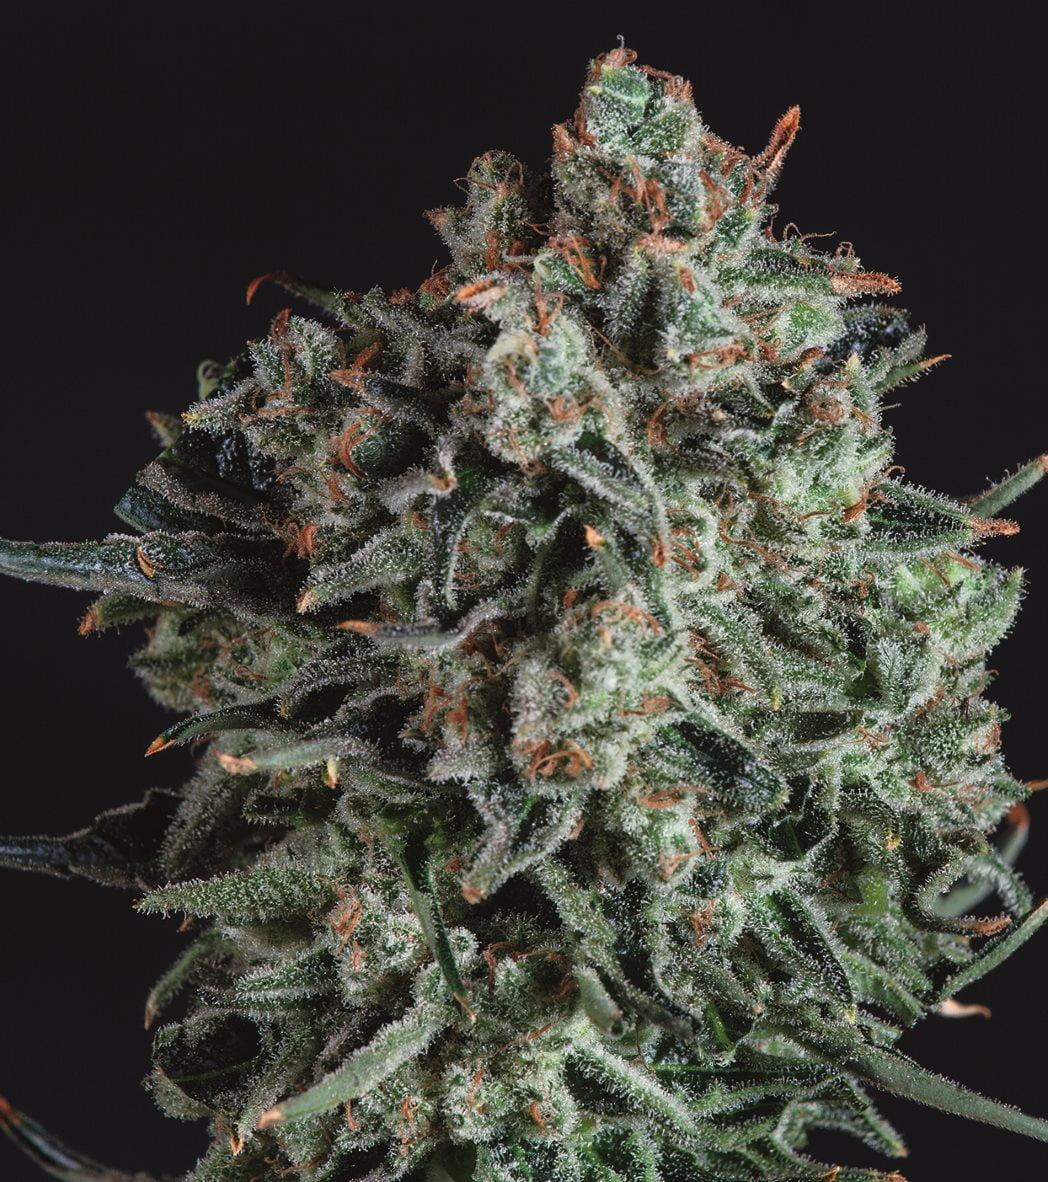 Blue Cheese x SCBDX Феминизированные семена-SCBDX-BLUCH-FEM-10